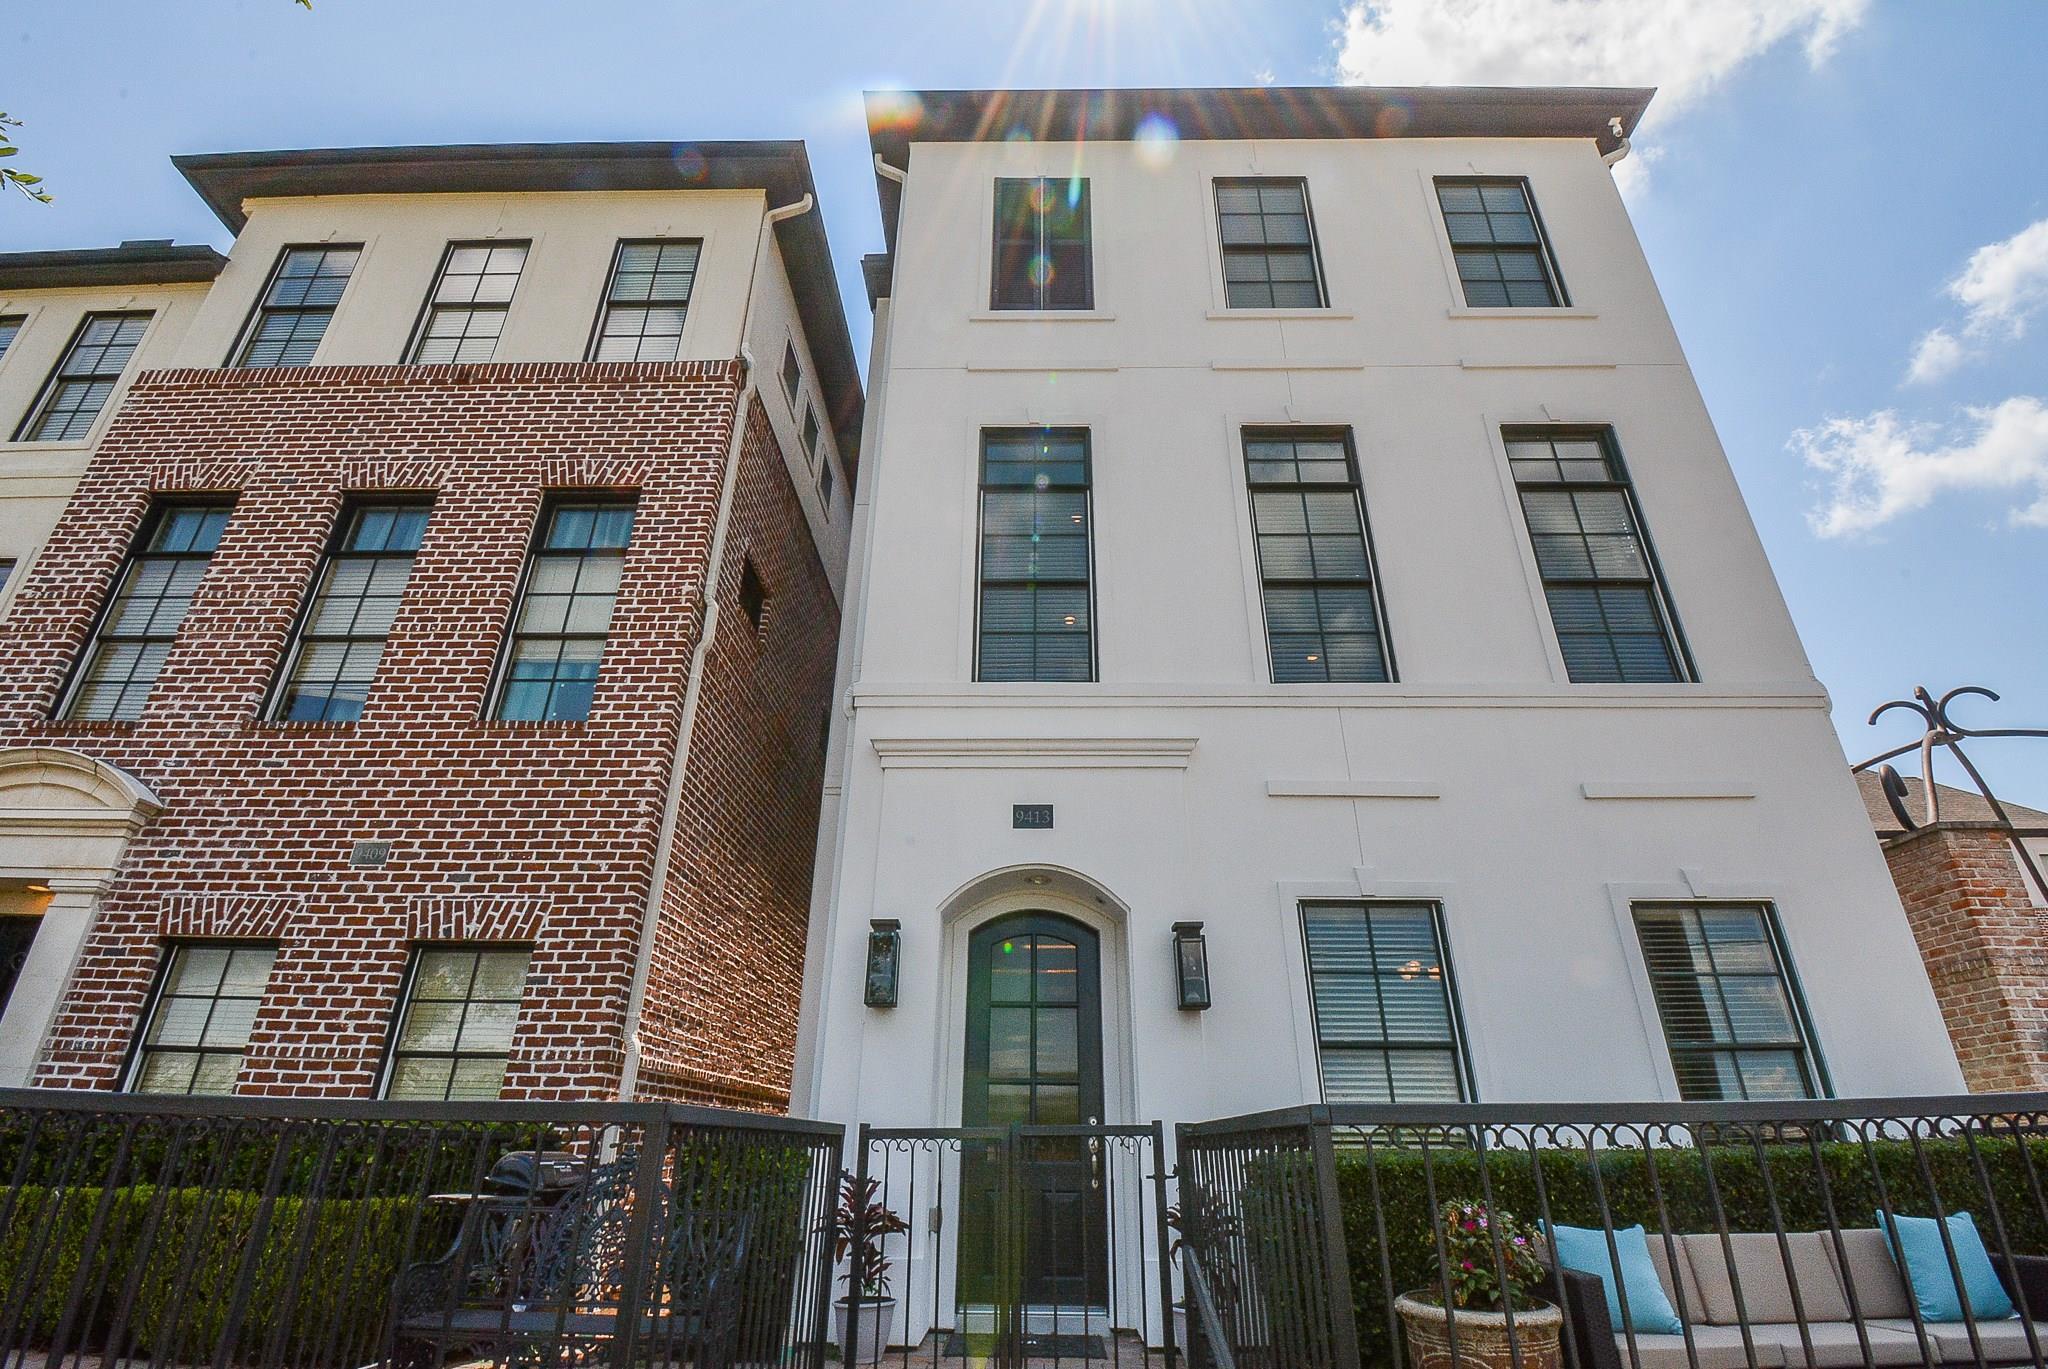 9413 Fannin Property Photo - Houston, TX real estate listing